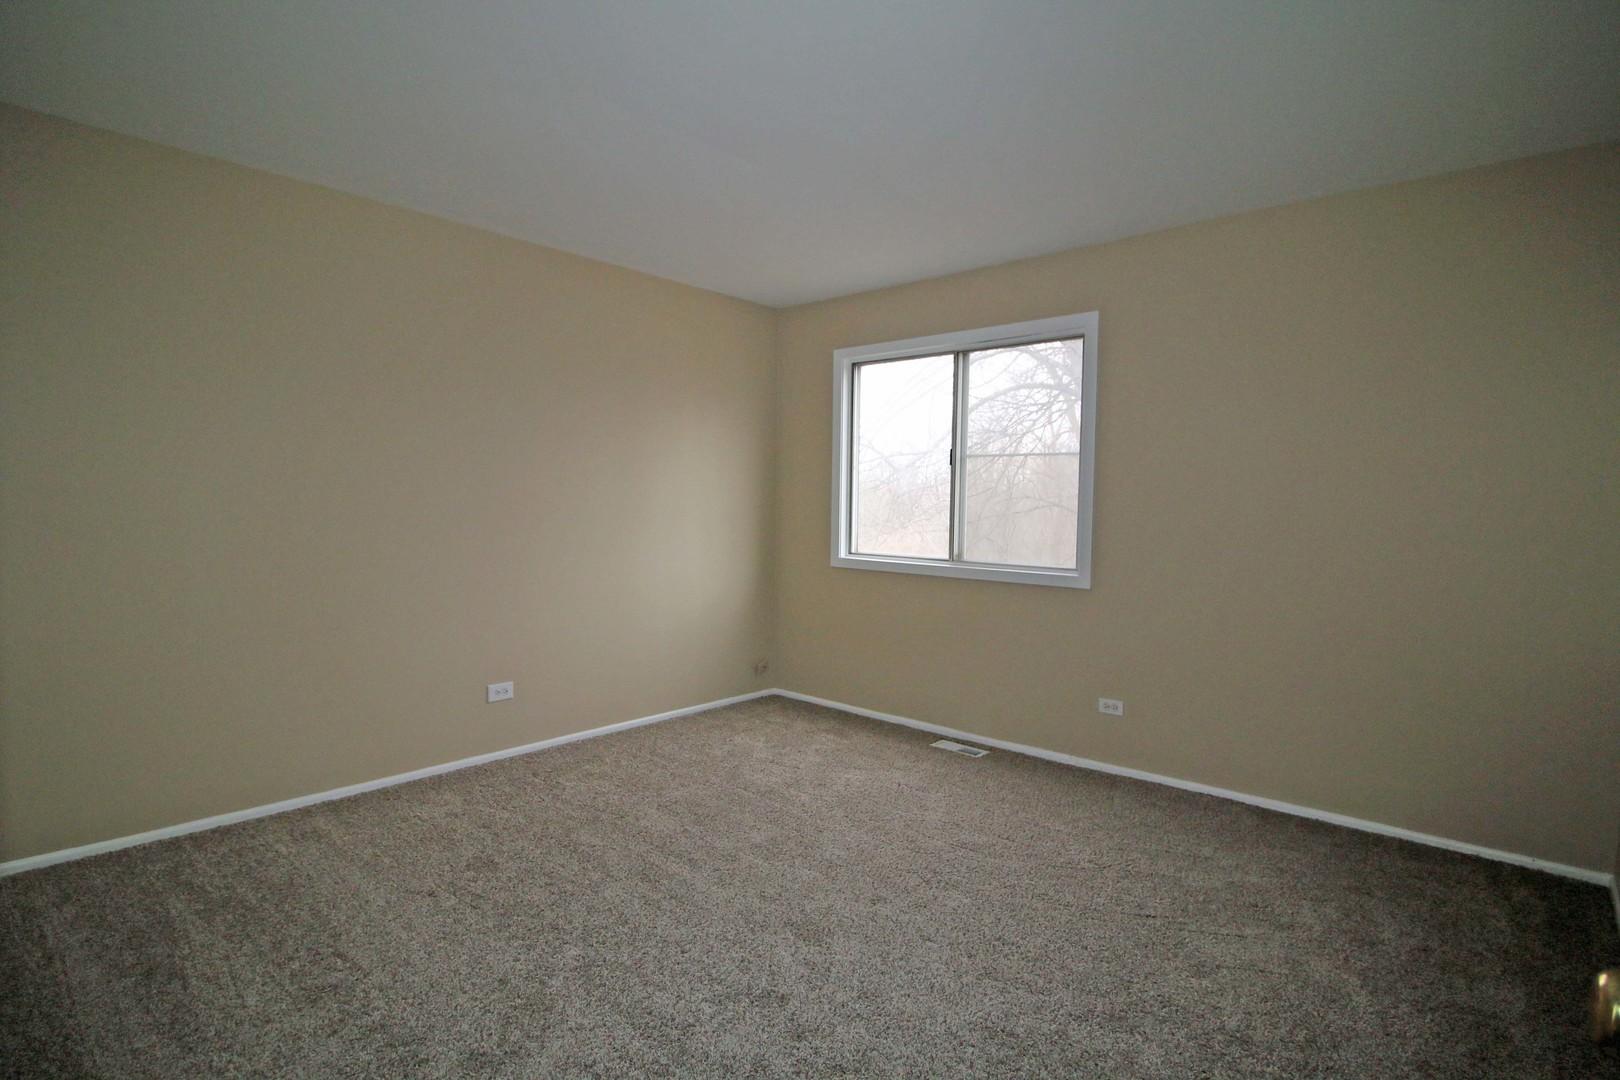 821 West Appletree, BARTLETT, Illinois, 60103